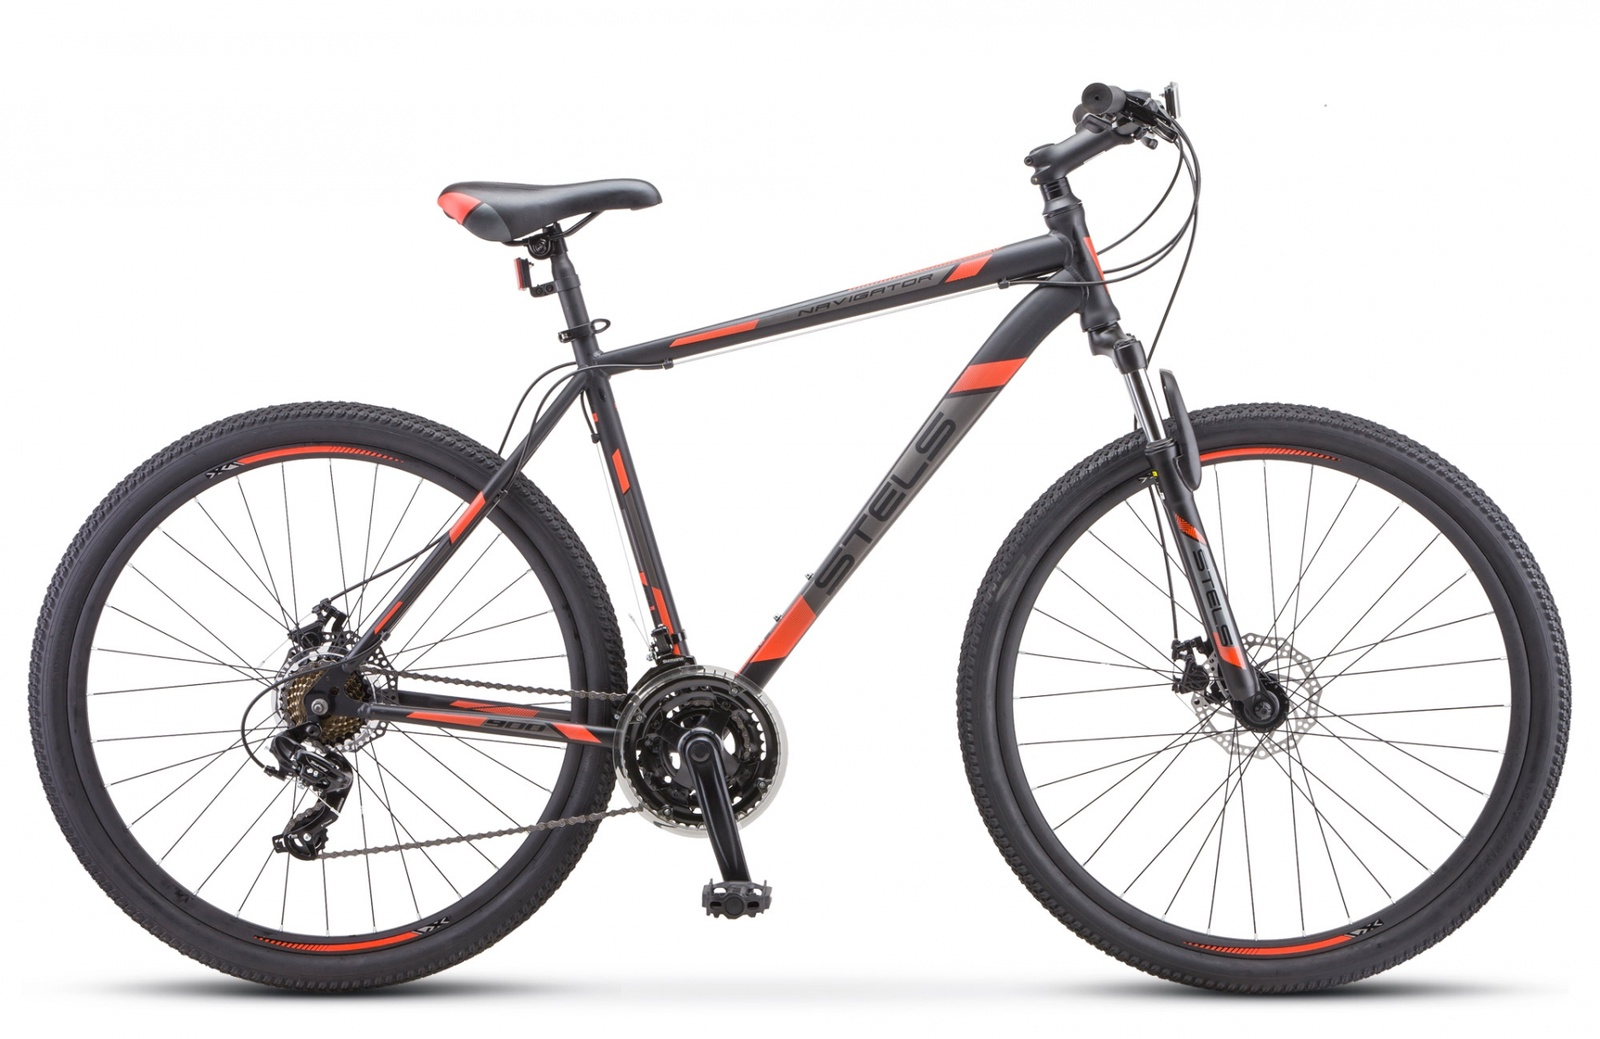 Велосипед Navigator 900 MD 29 F010 (2019), рама 19 дюйм